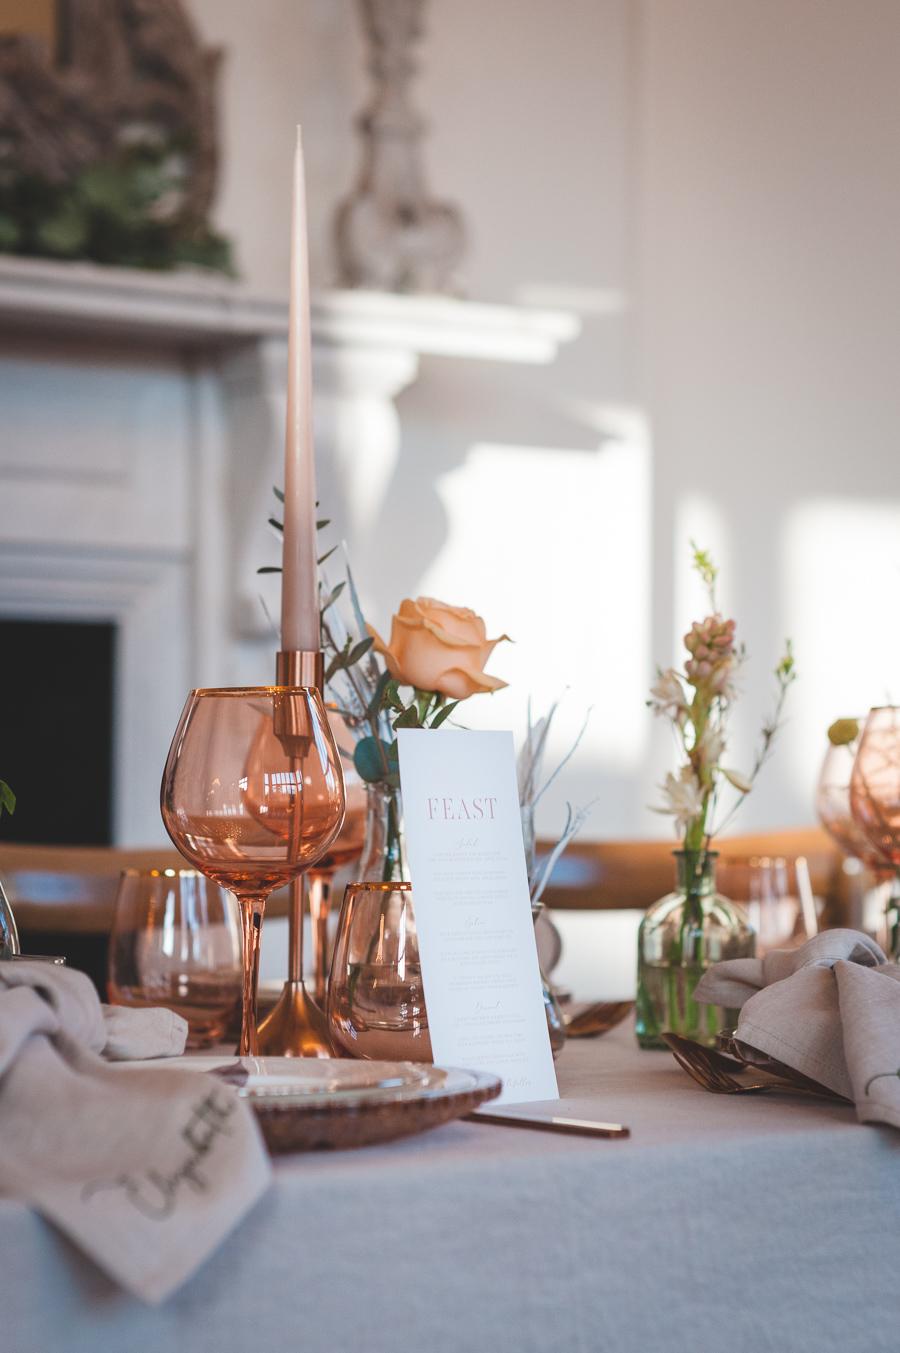 Yorkshire wedding venue styling ideas, photo credit Boho Chic Weddings (16)